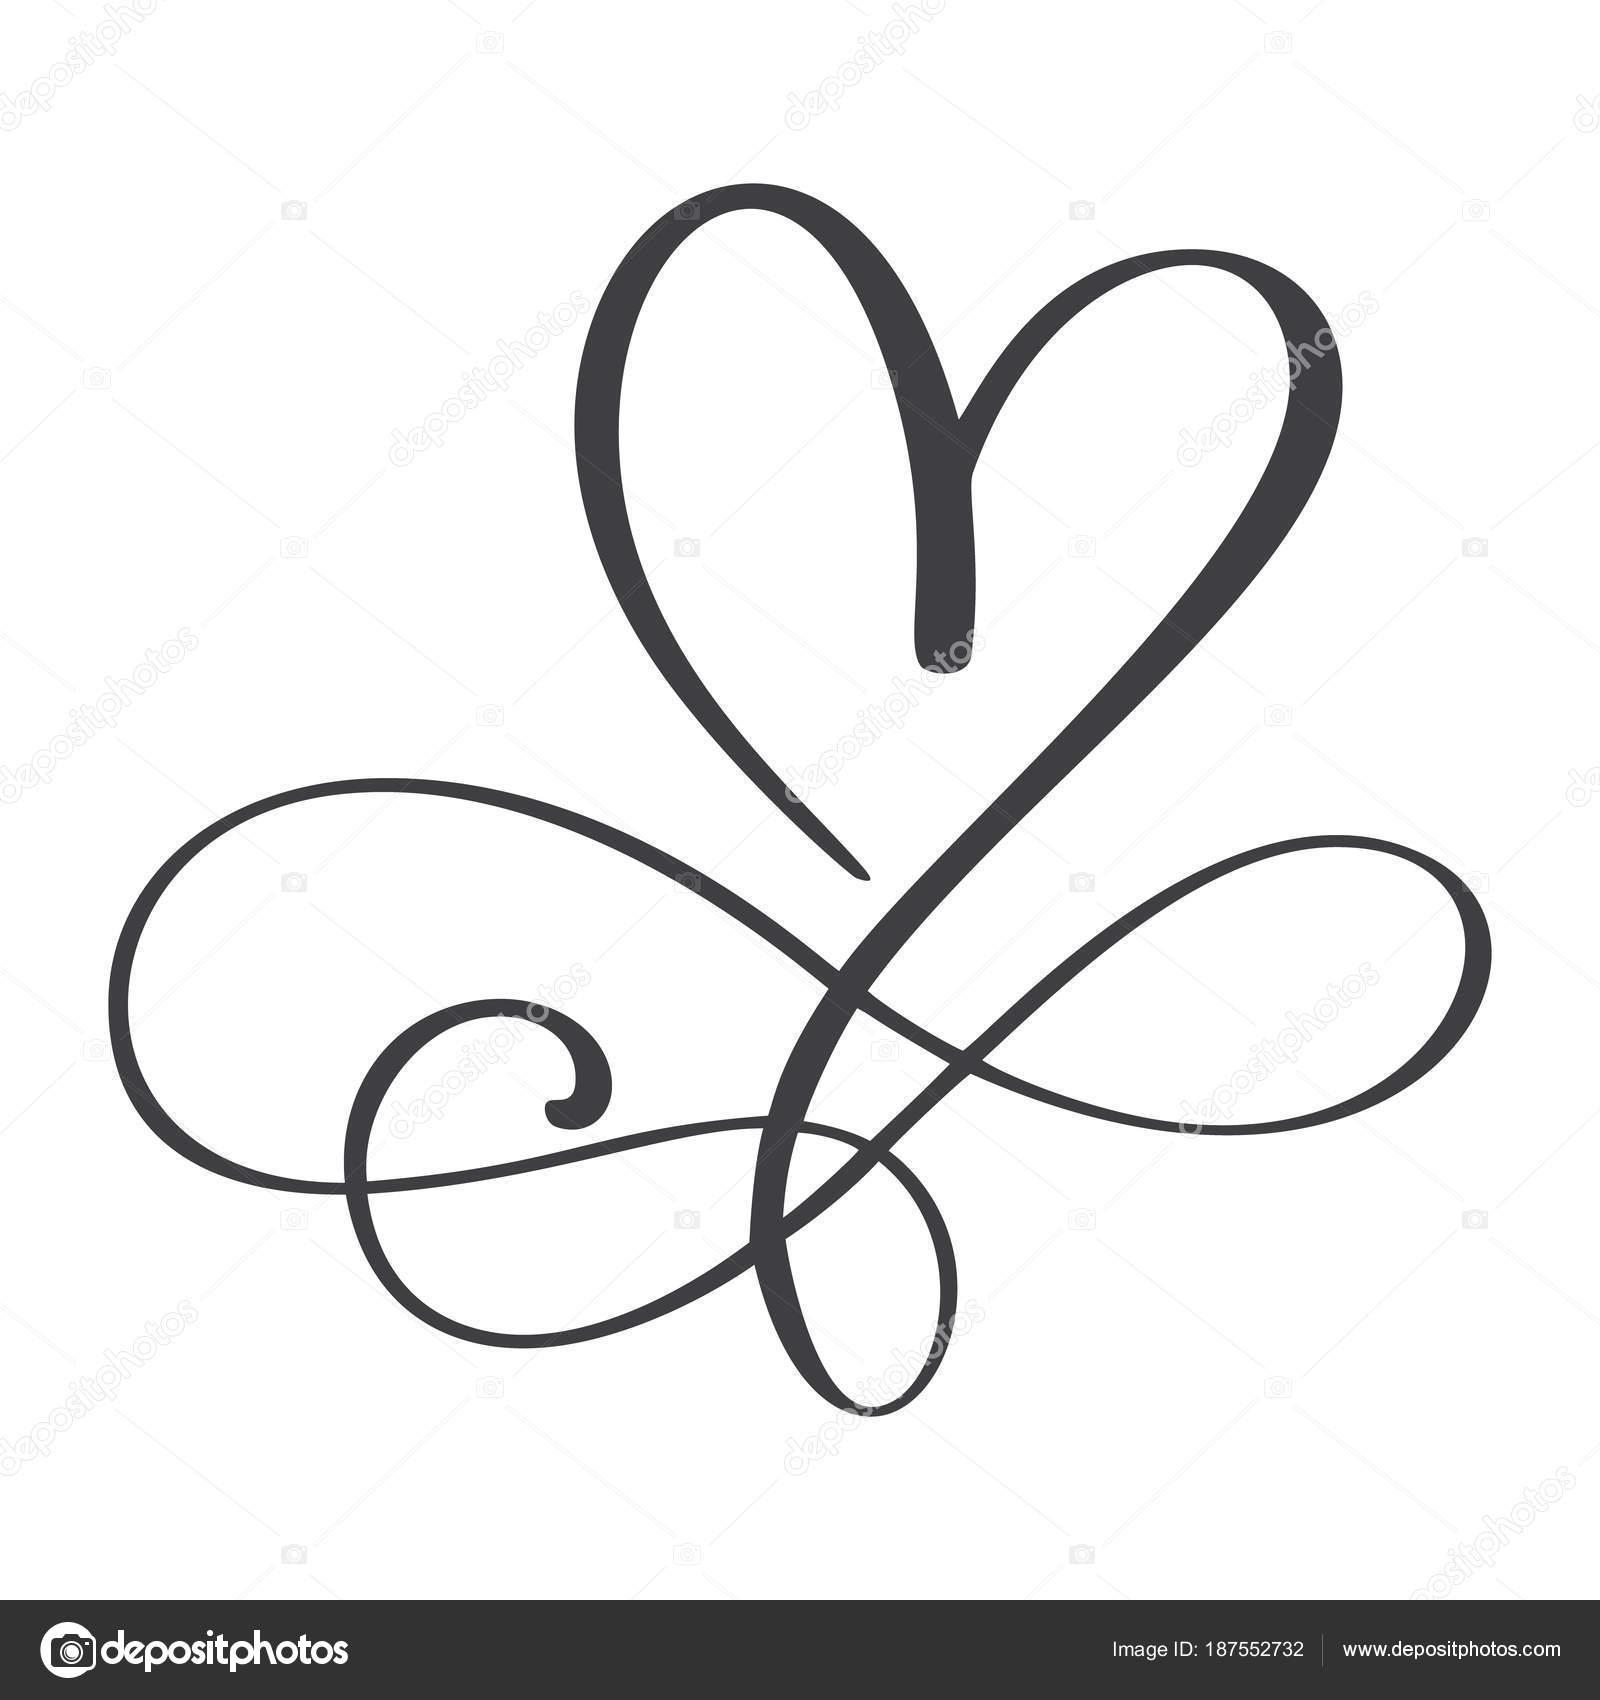 love symbol spirit never global medium my thrive ends is infinity